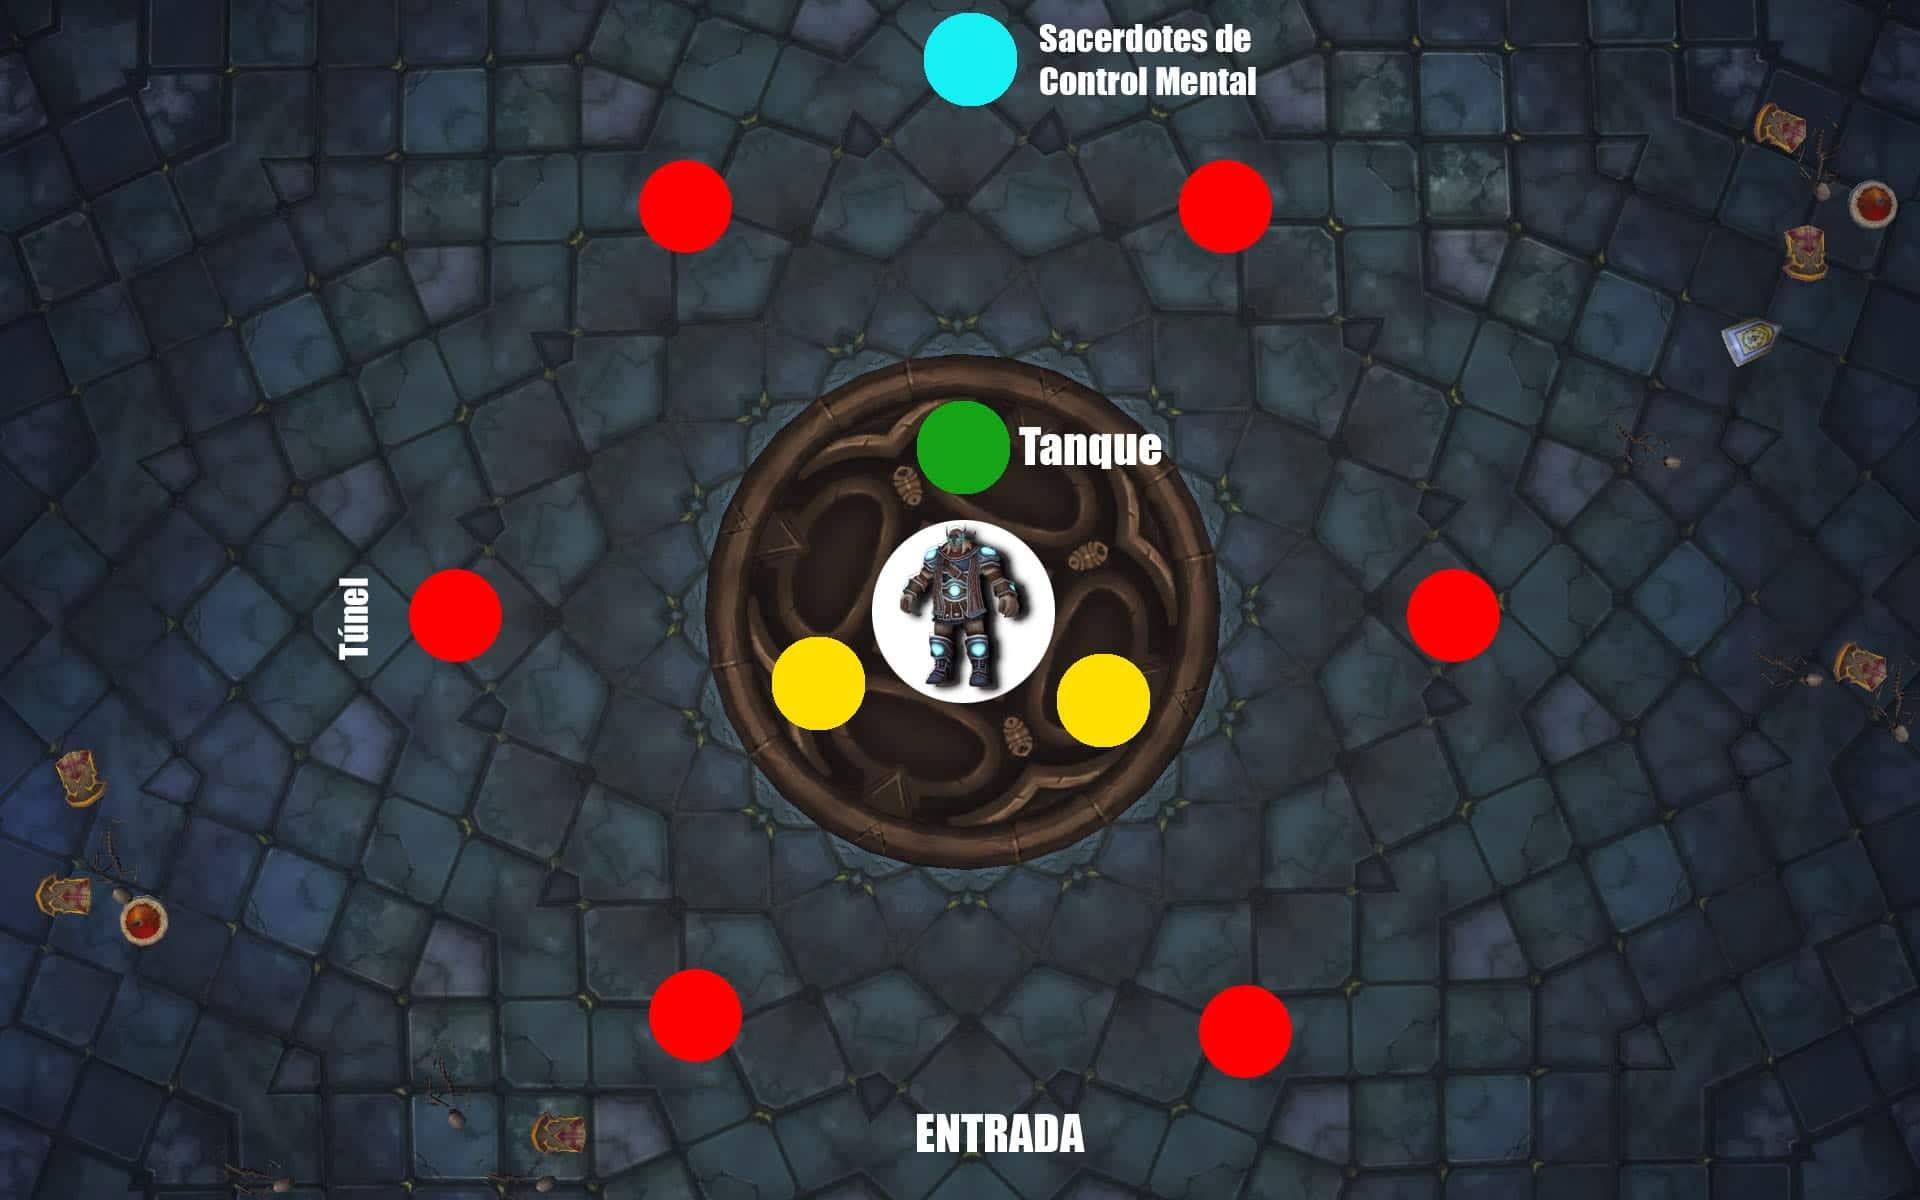 fase_2_posicionamiento_thorim